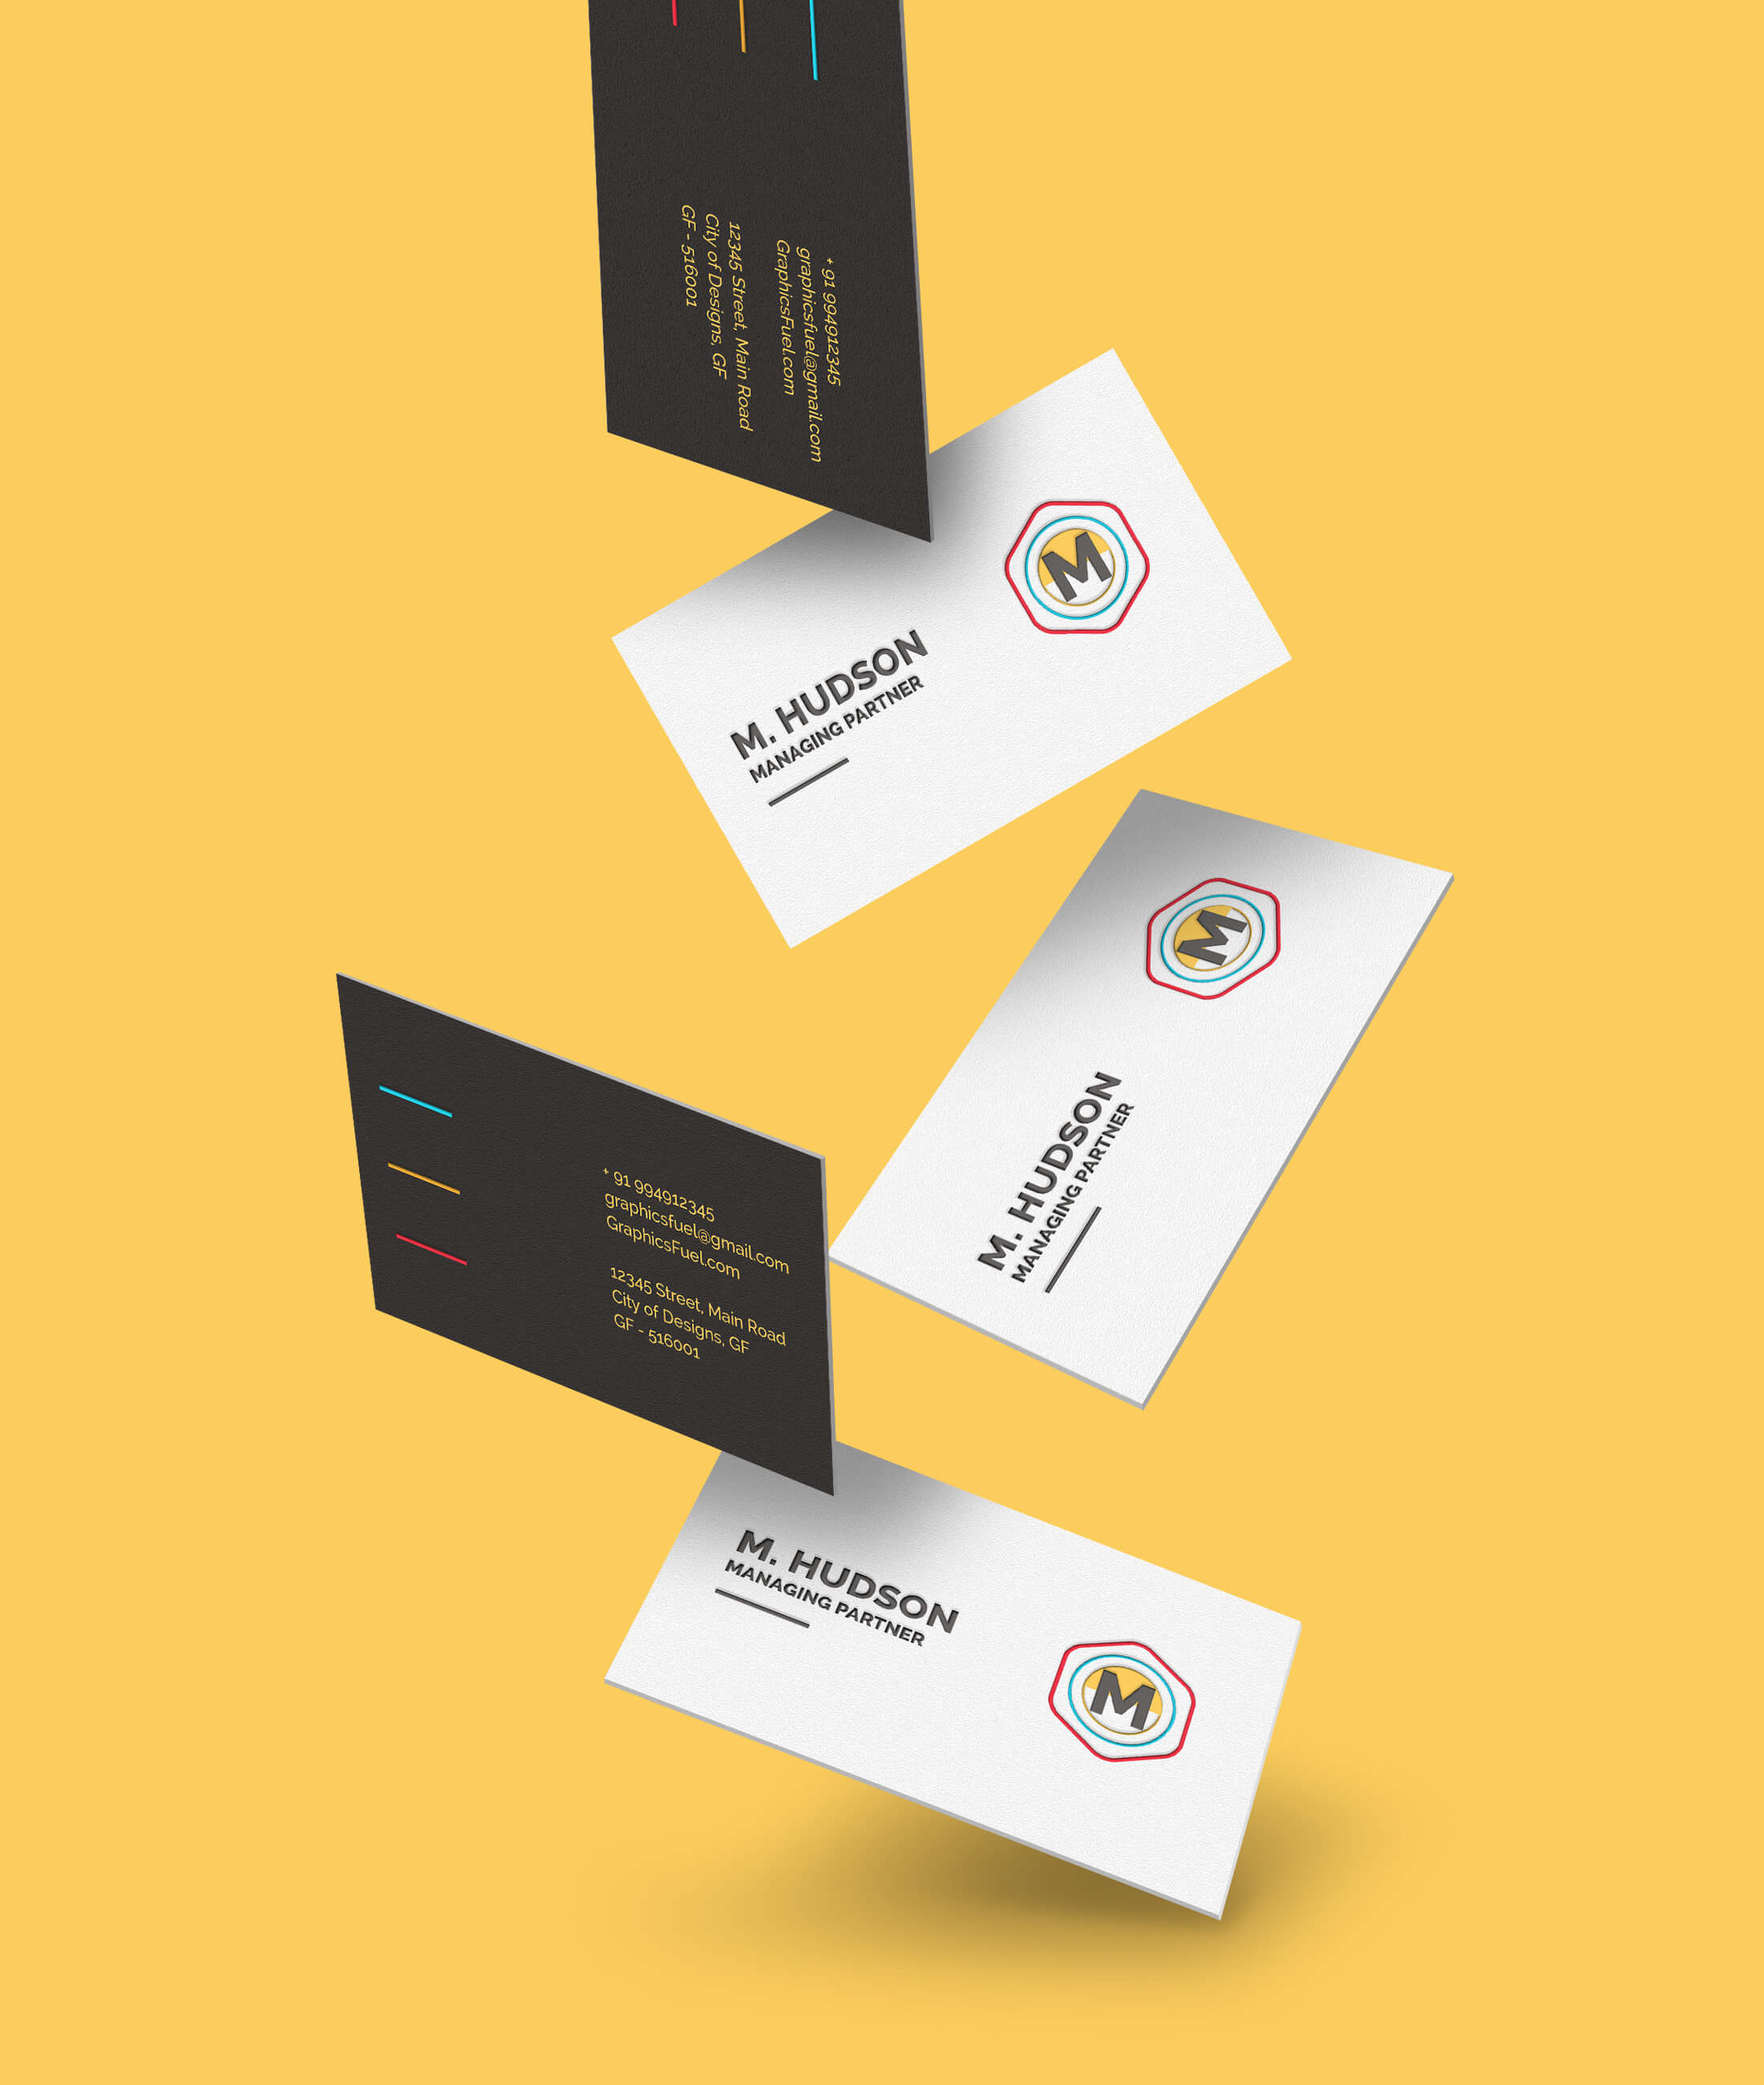 Levitating Business Card Mockups